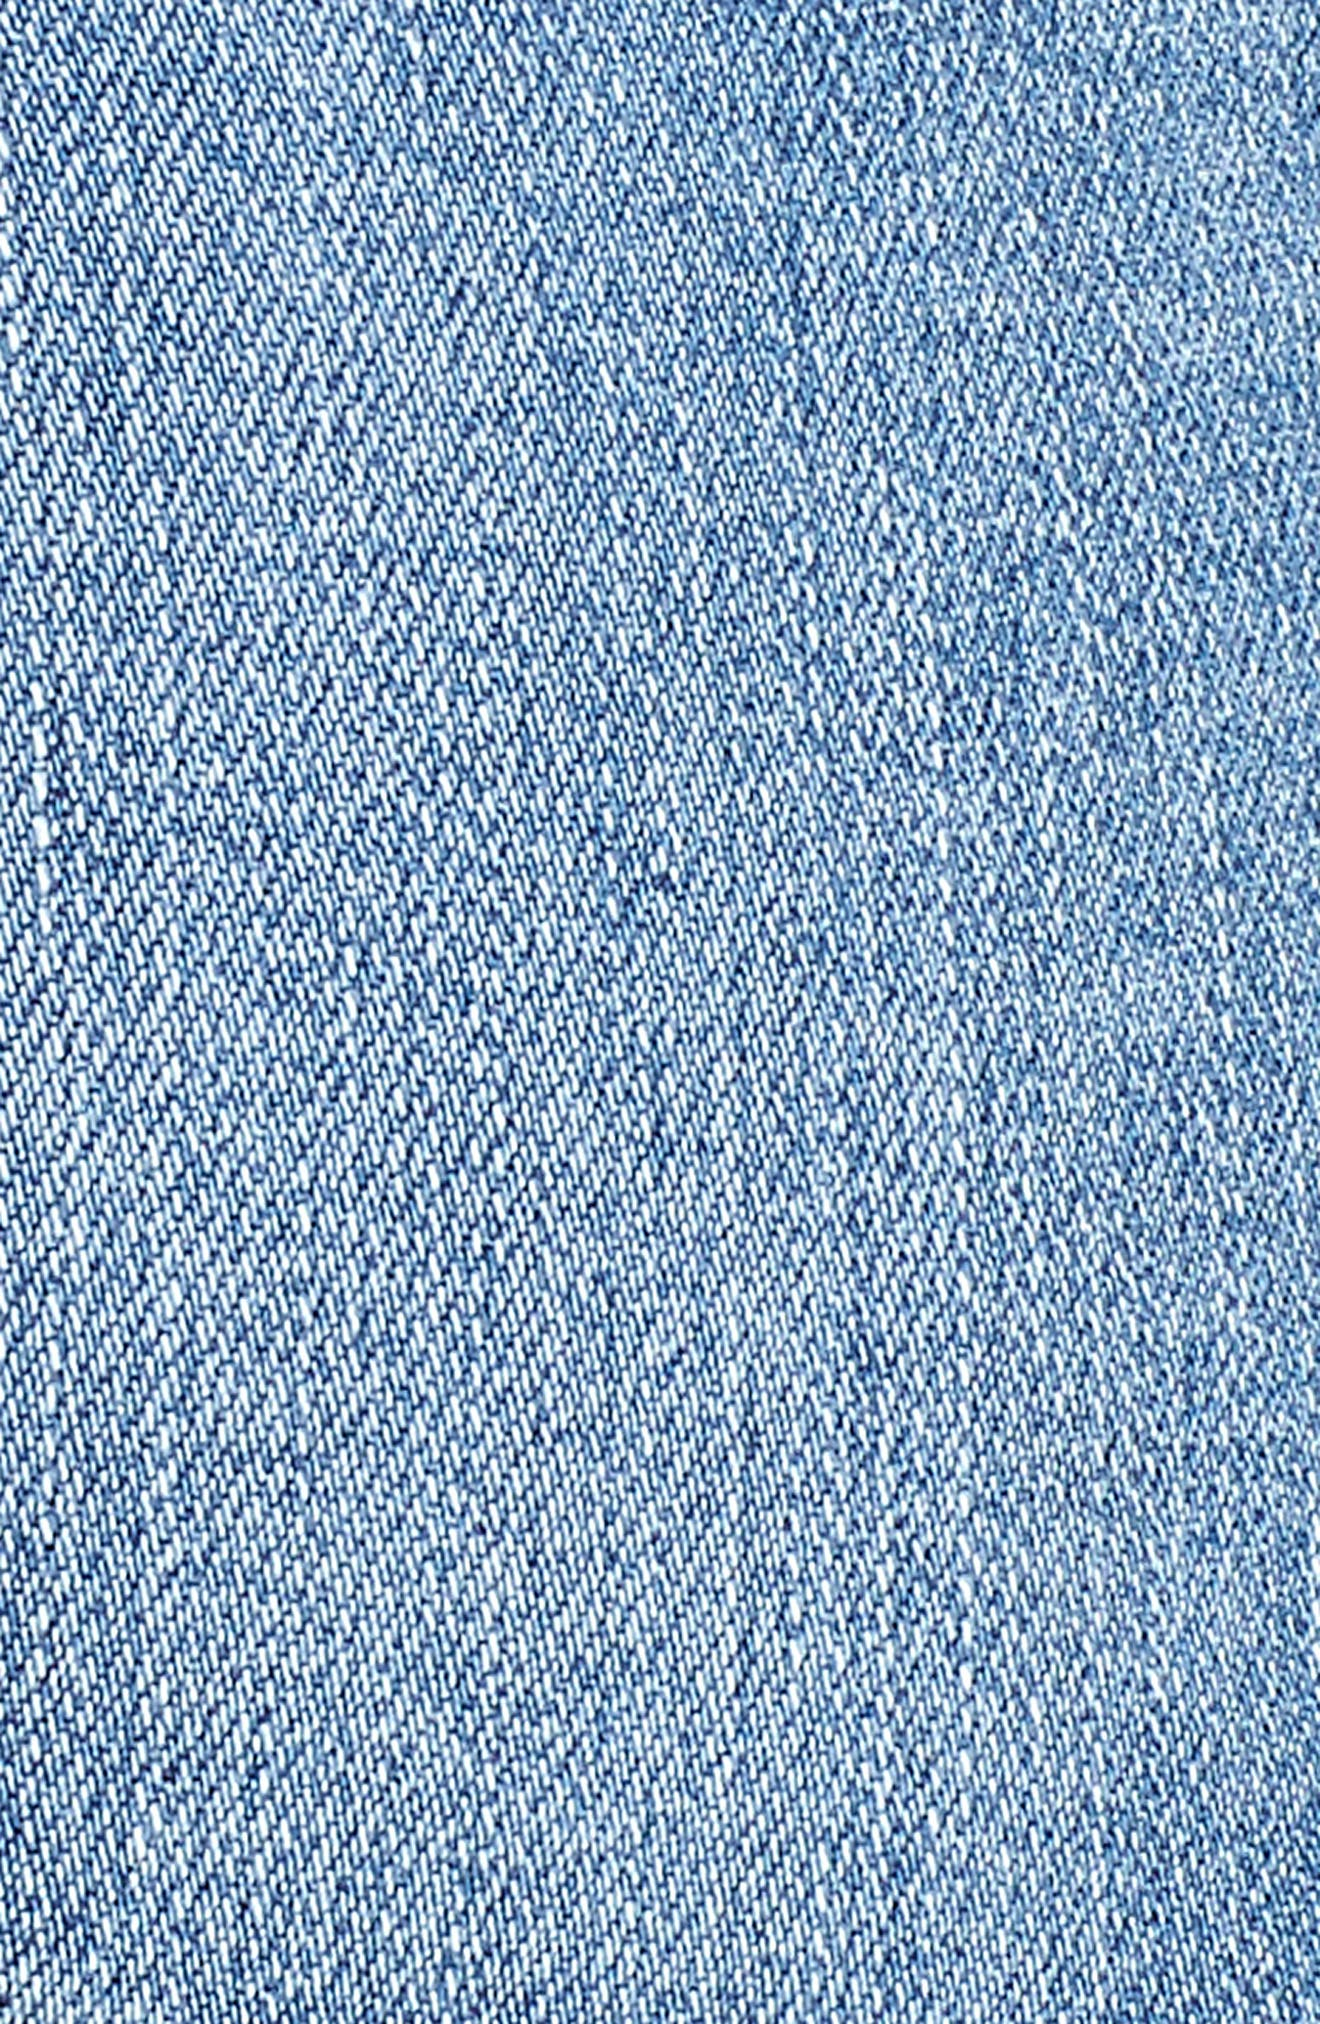 Transcend - Verdugo Ankle Ultra Skinny Jeans,                             Alternate thumbnail 5, color,                             400